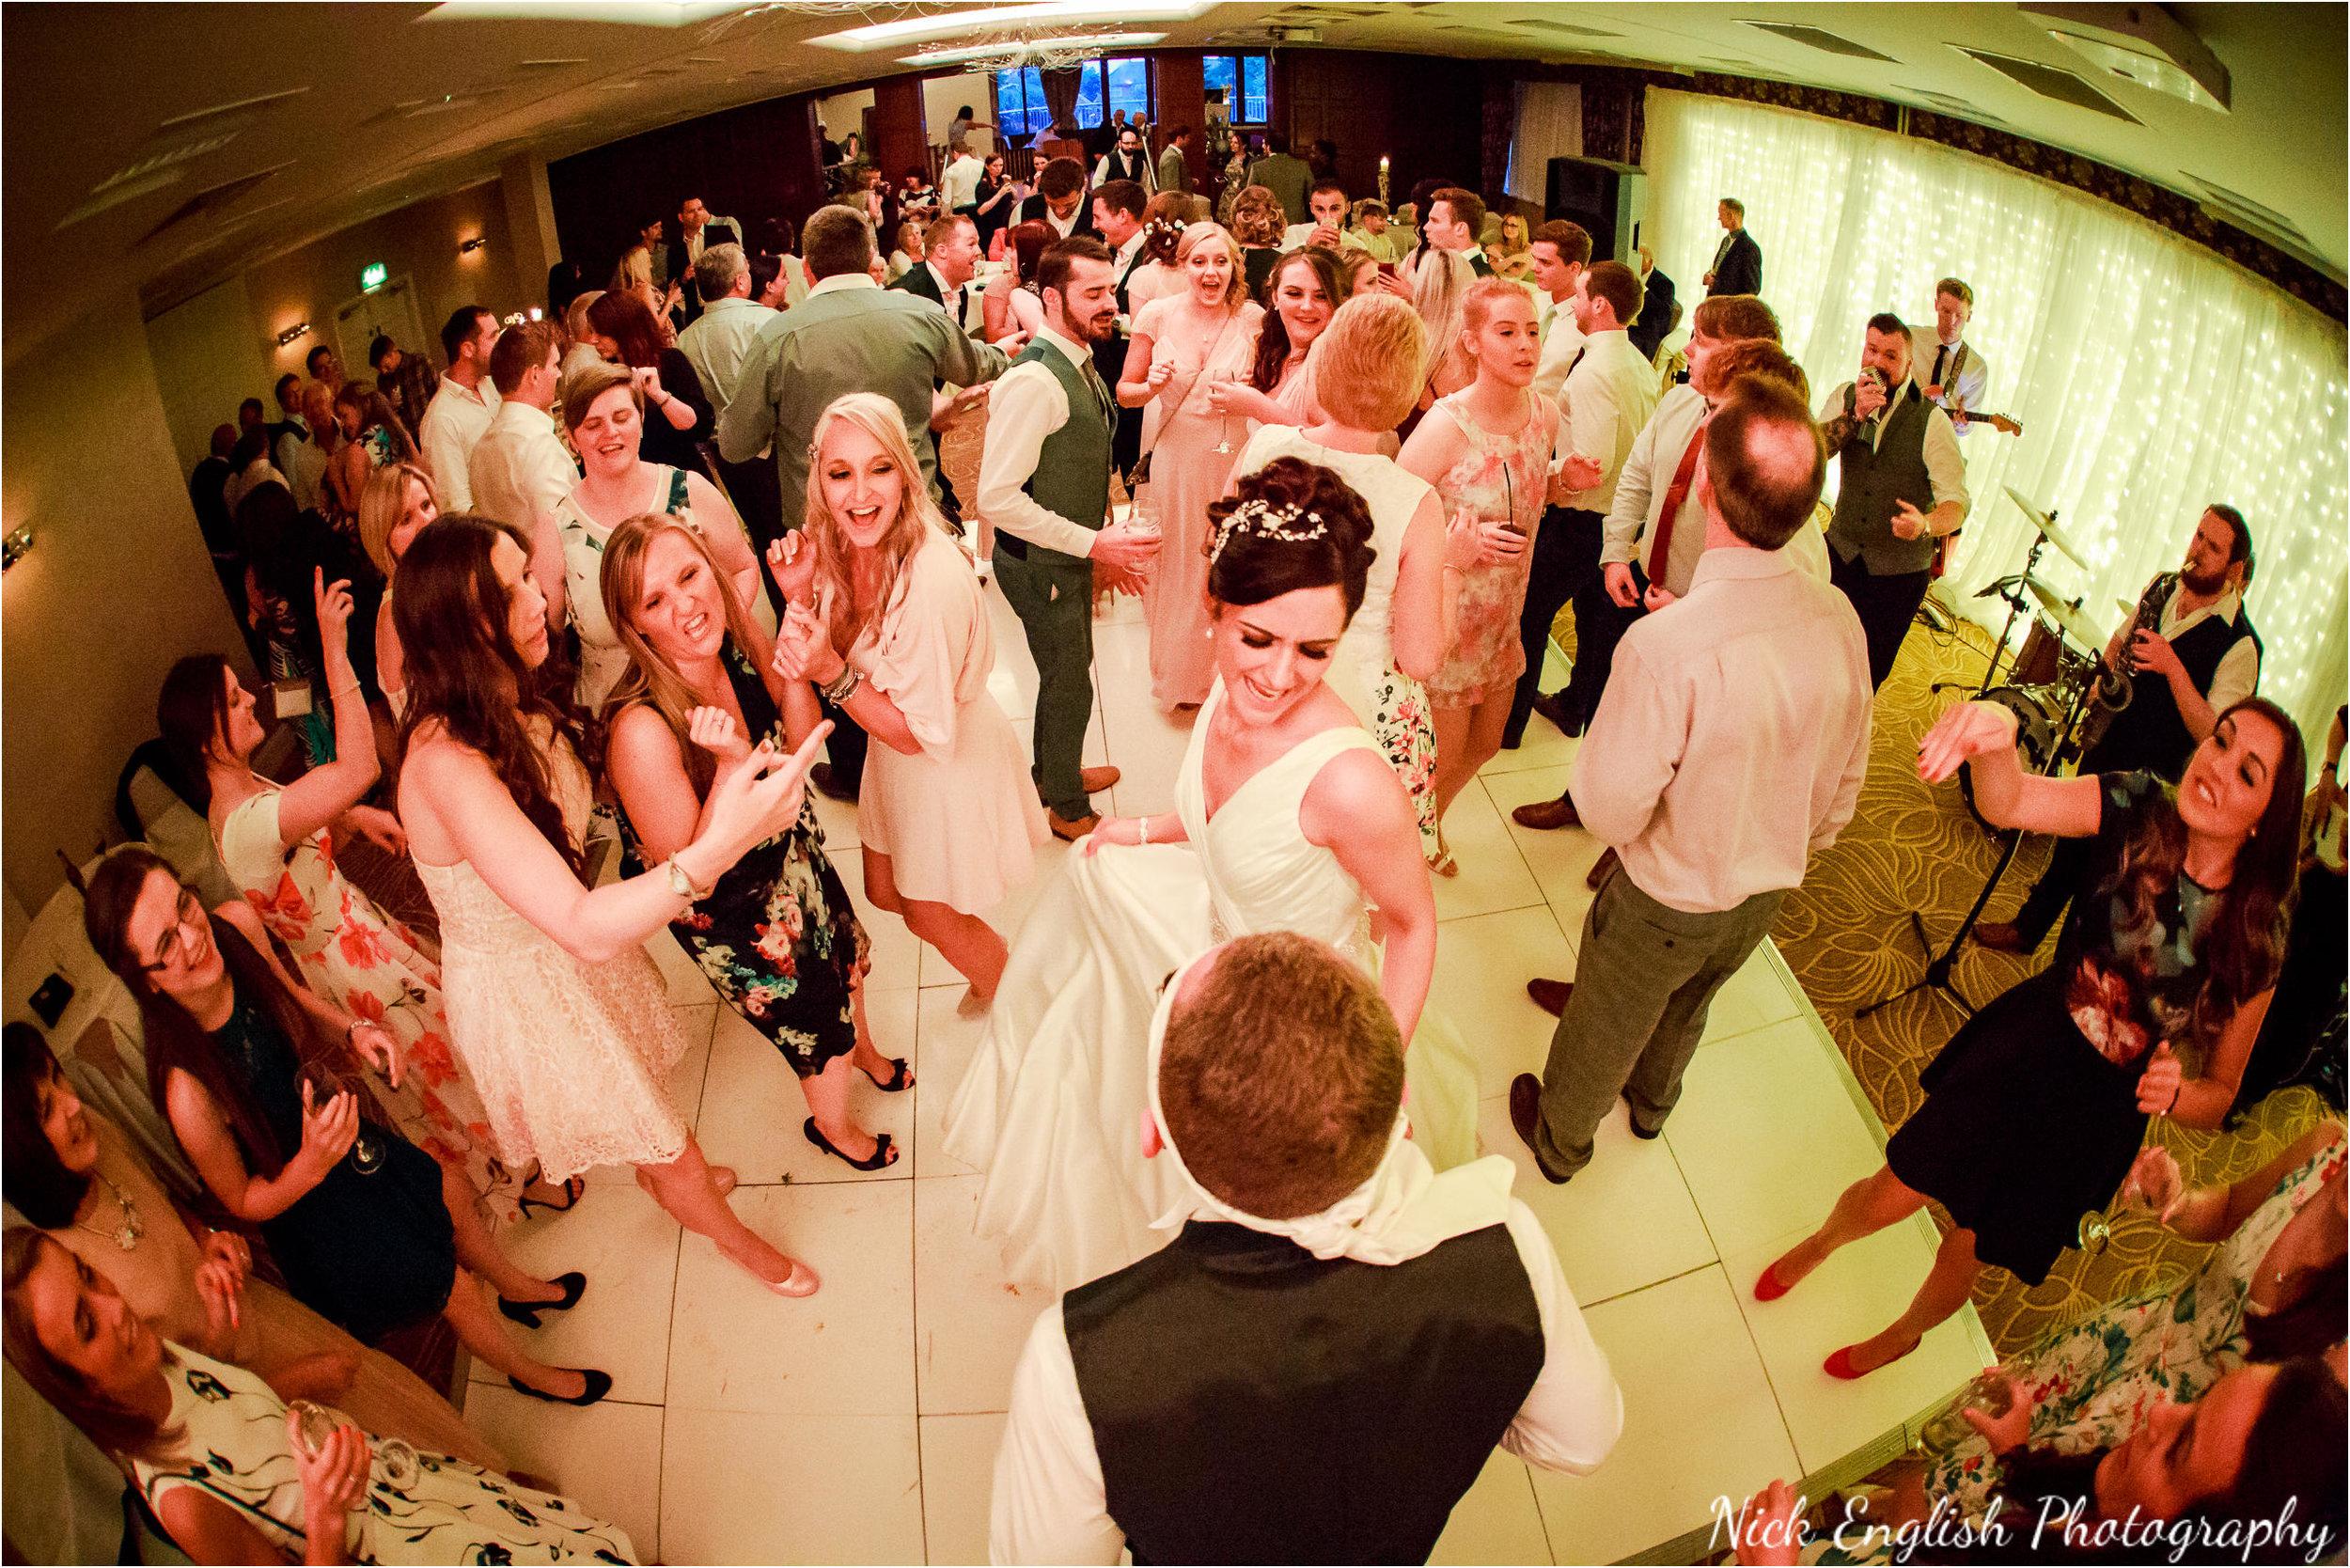 Emily David Wedding Photographs at Barton Grange Preston by Nick English Photography 235jpg.jpeg